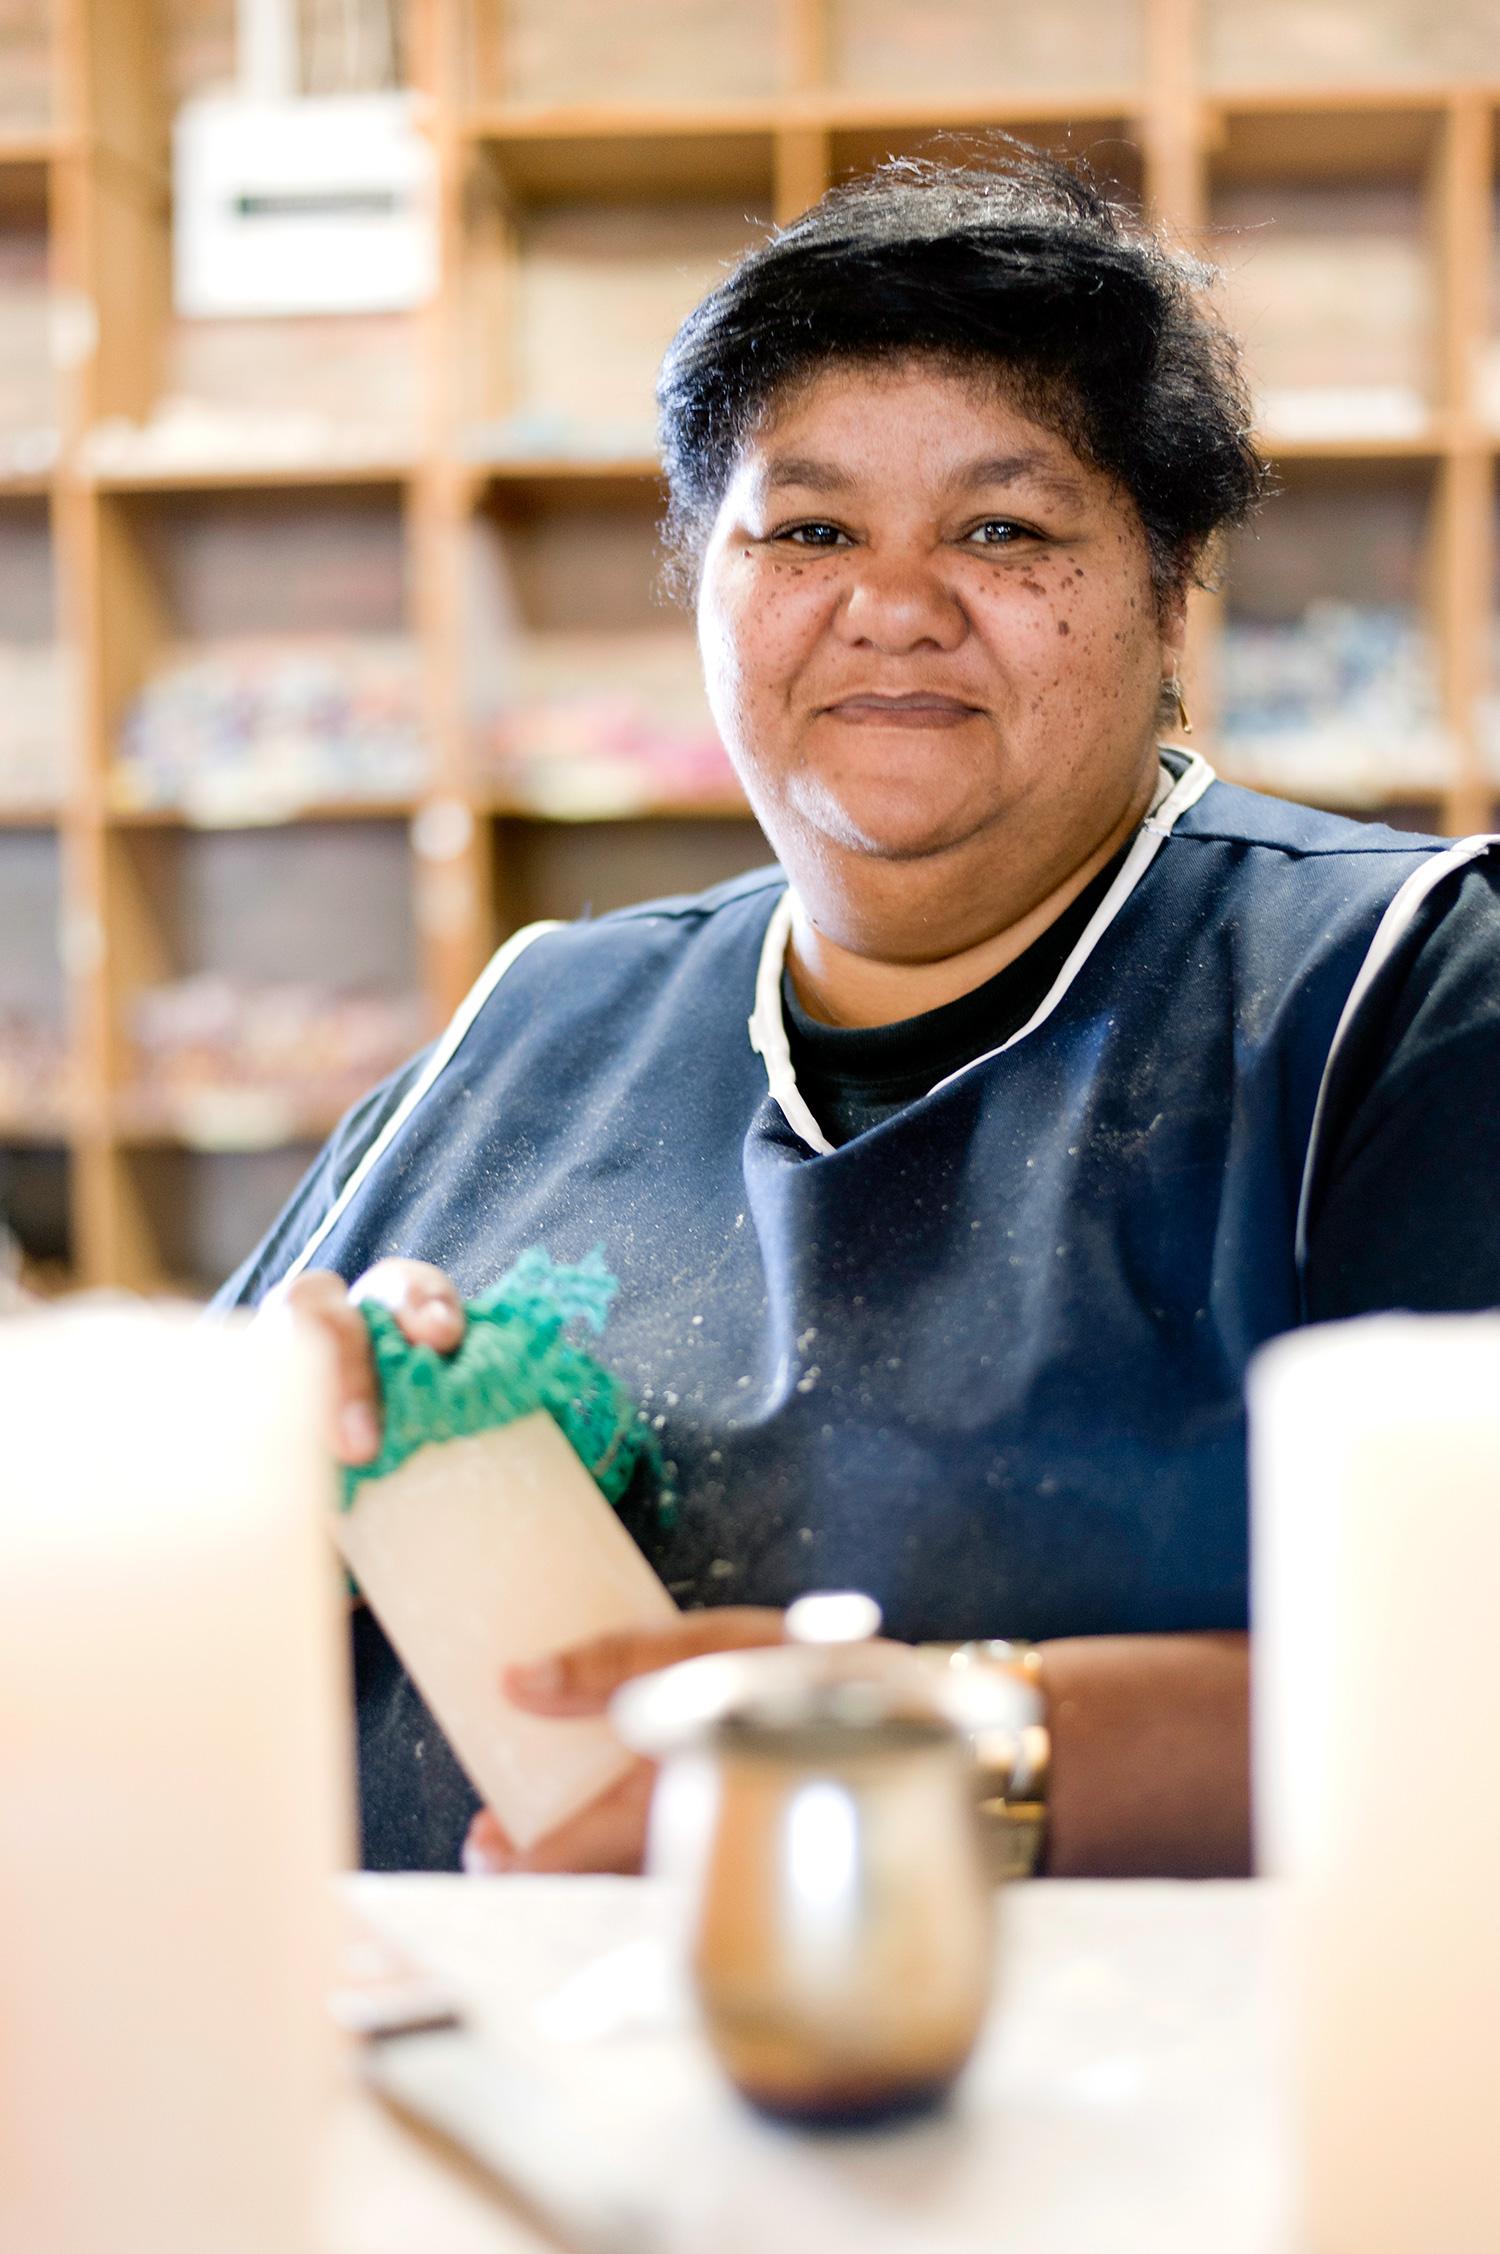 kapula-handmade-premium-fragranced-candles-working-smile.jpg